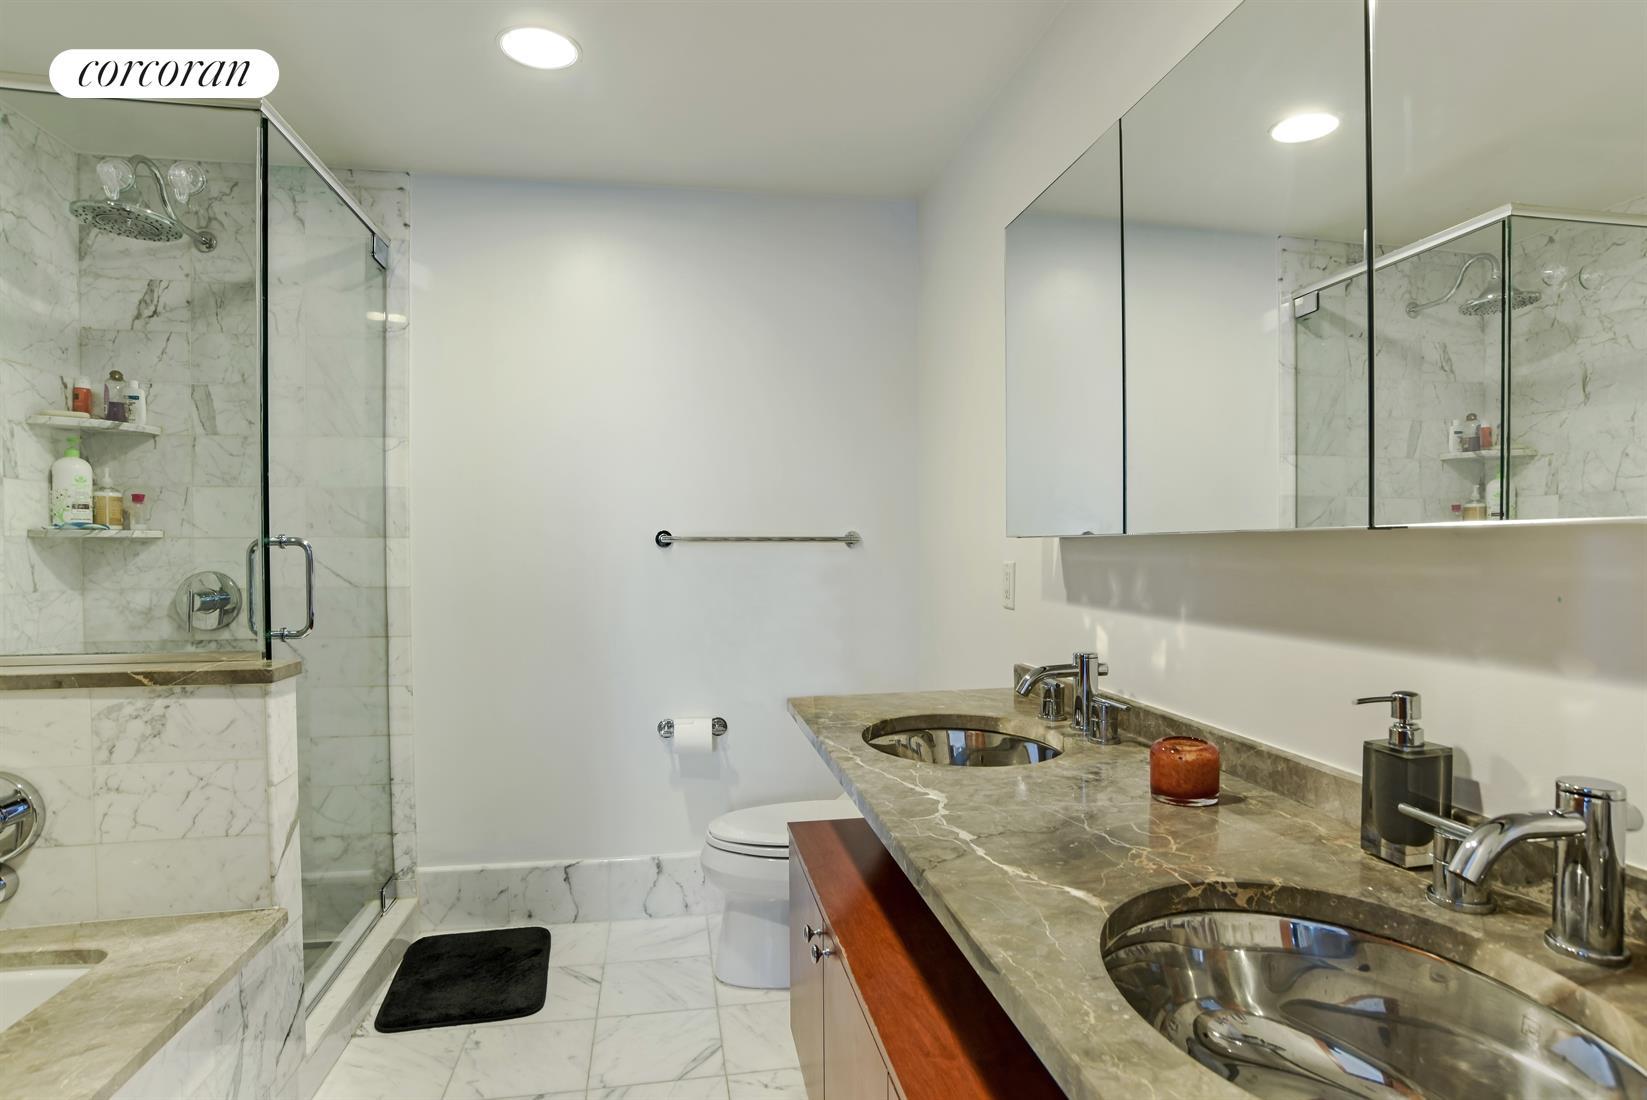 Corcoran, 440 Kent Avenue, Apt. 11D, Williamsburg Real Estate ...